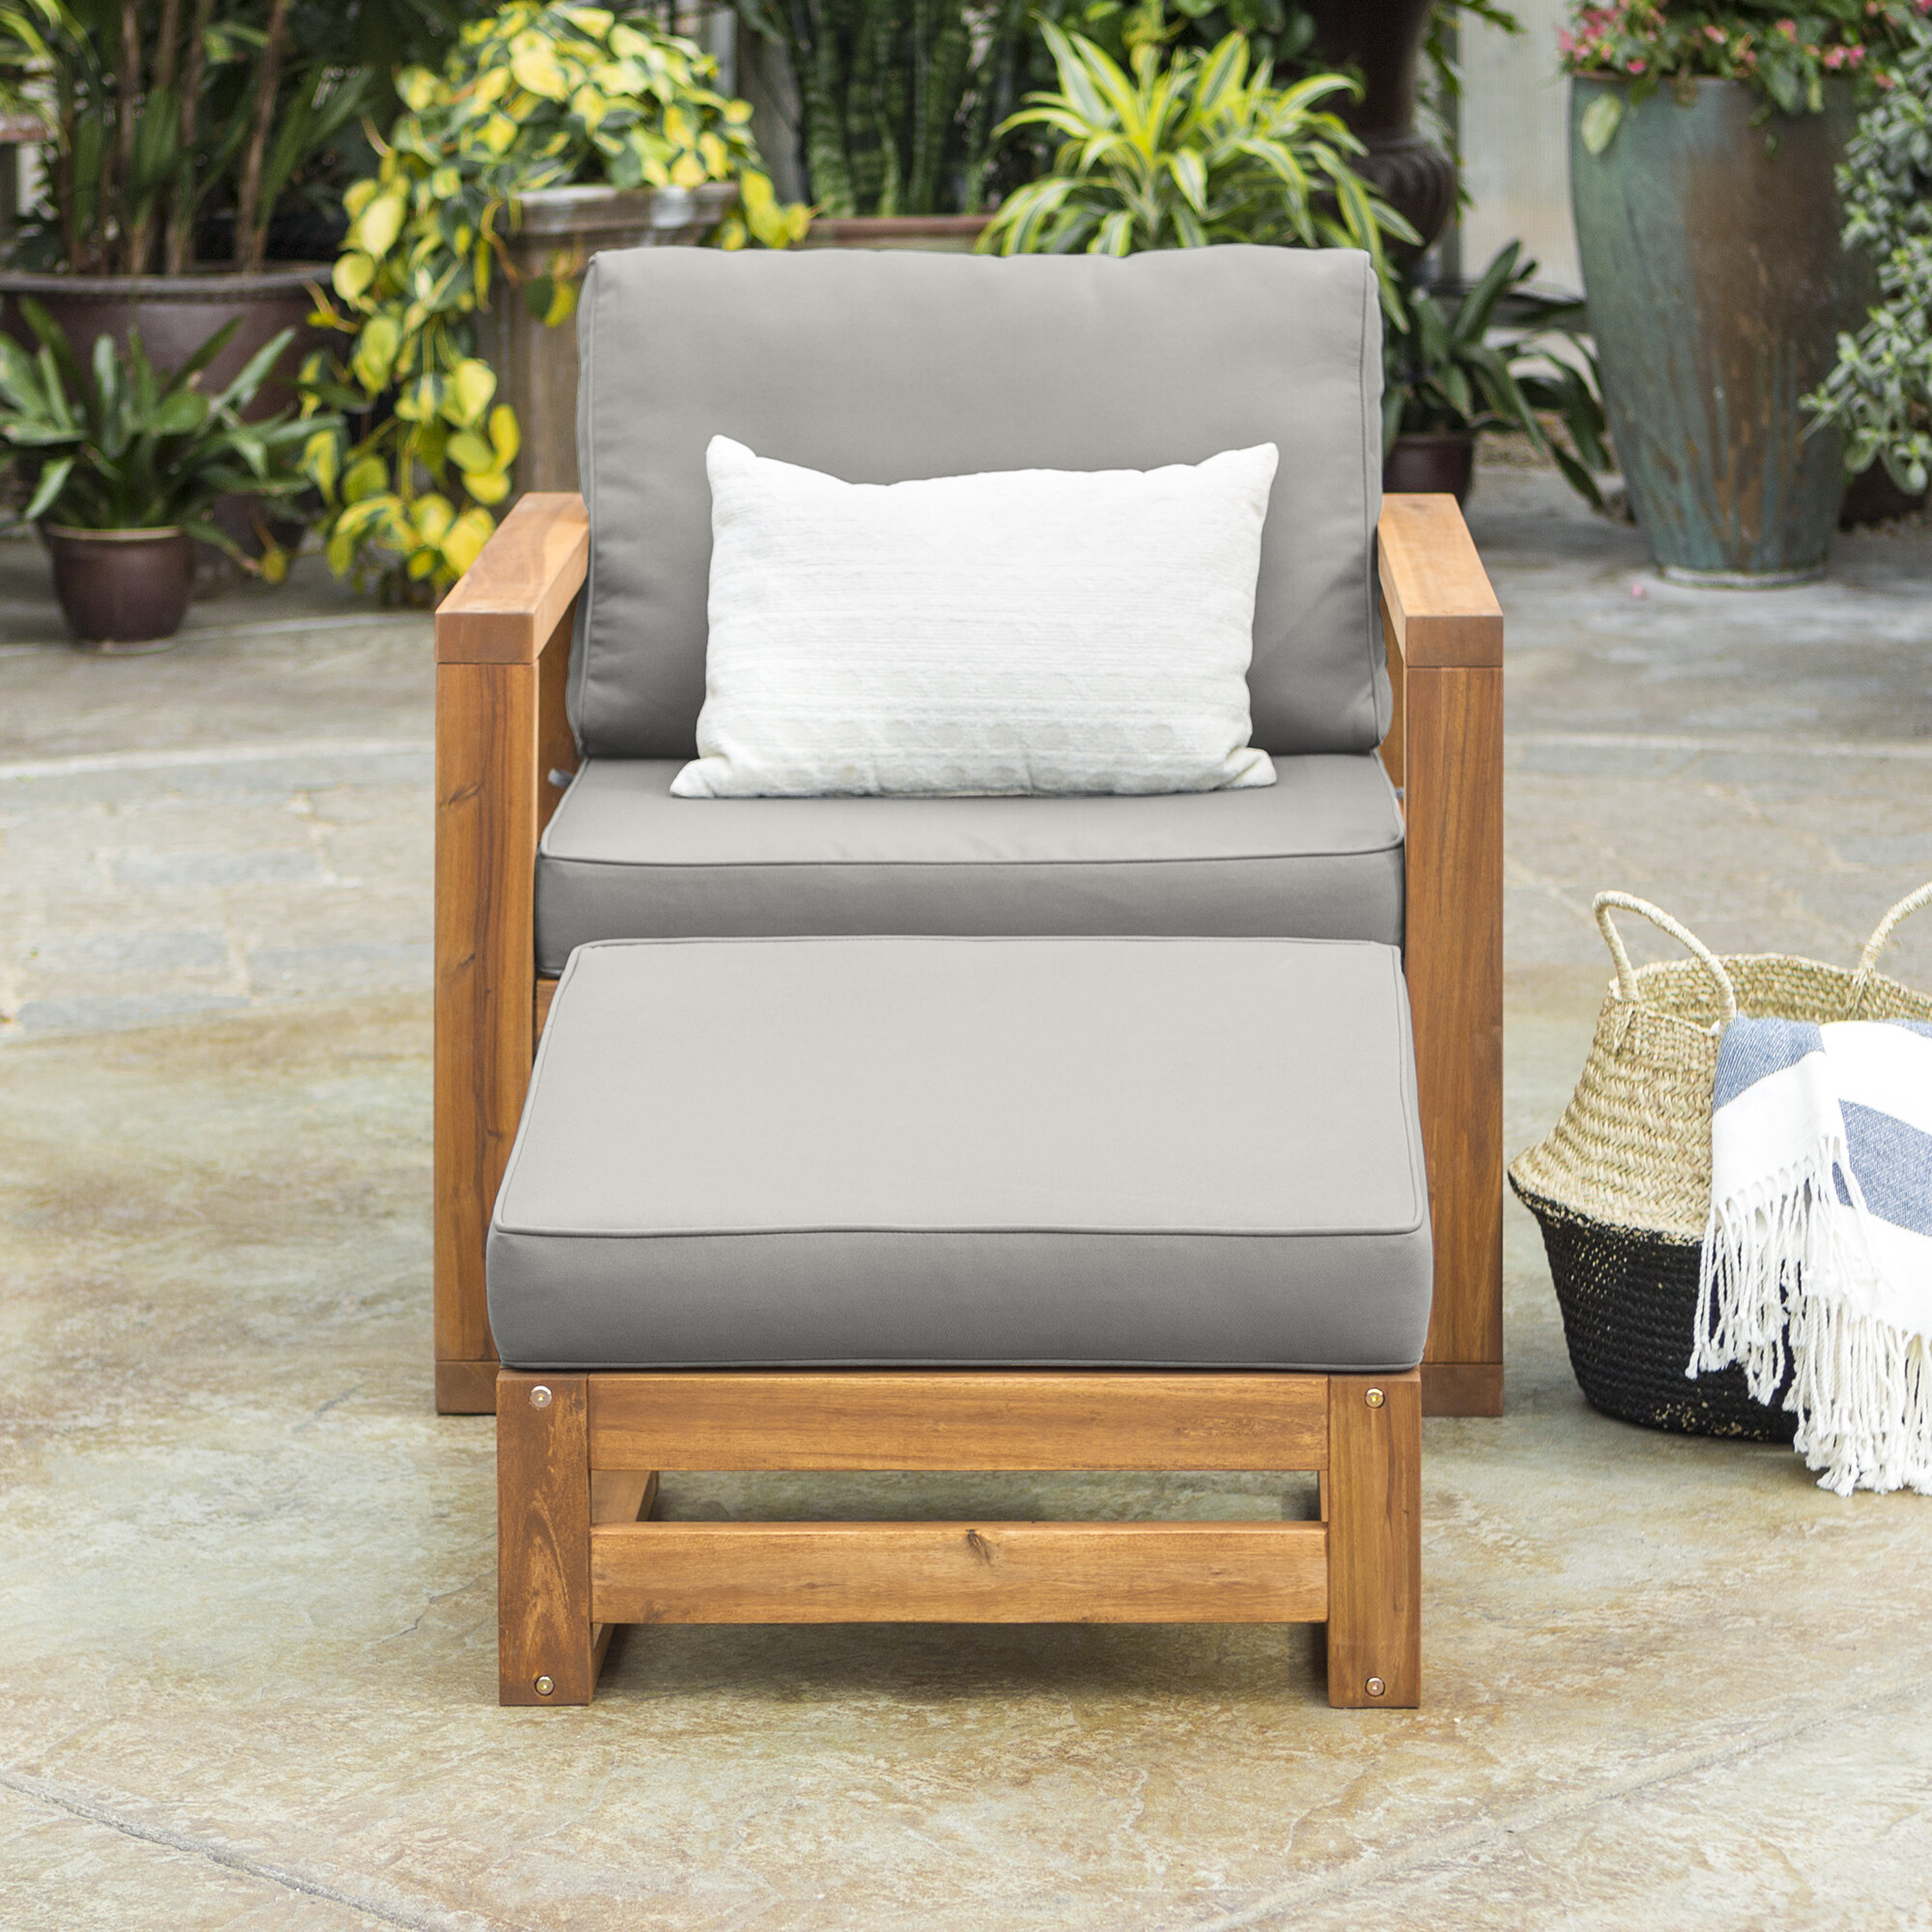 Charmant Lydon Patio Chair With Cushion And Ottoman